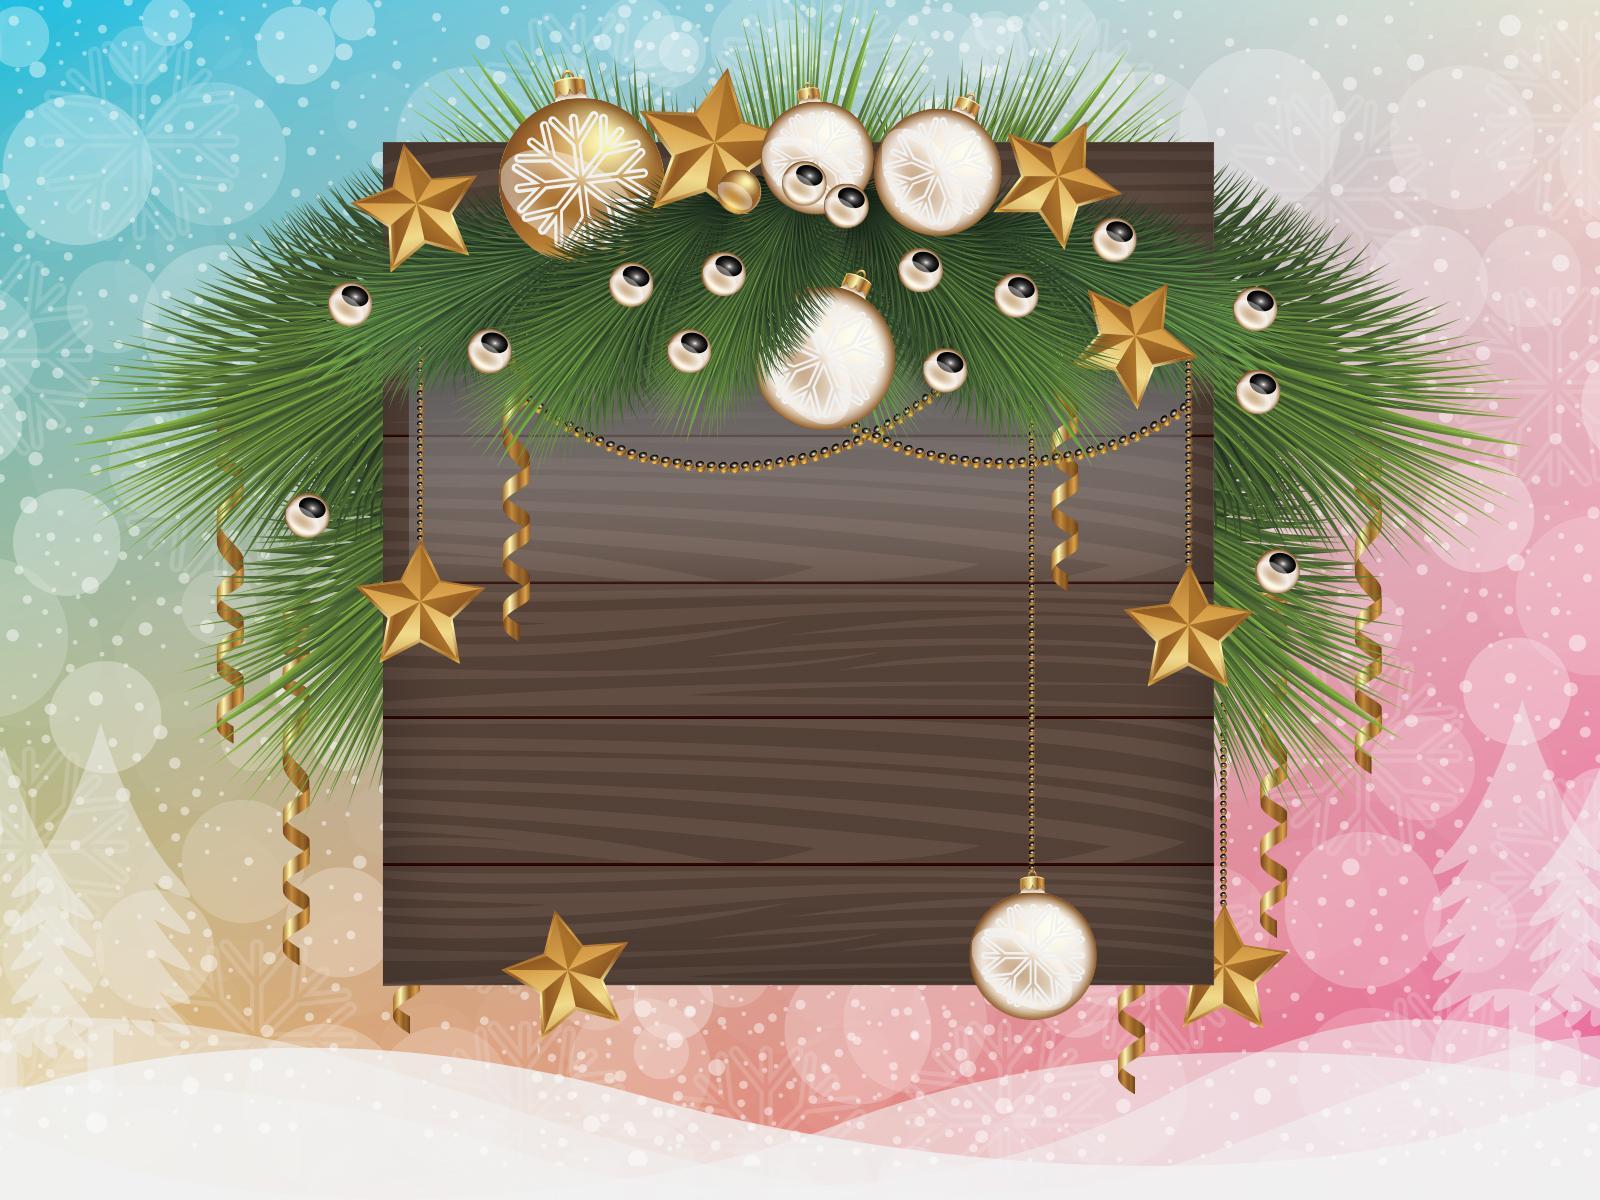 Christmas Frame PPT Backgrounds